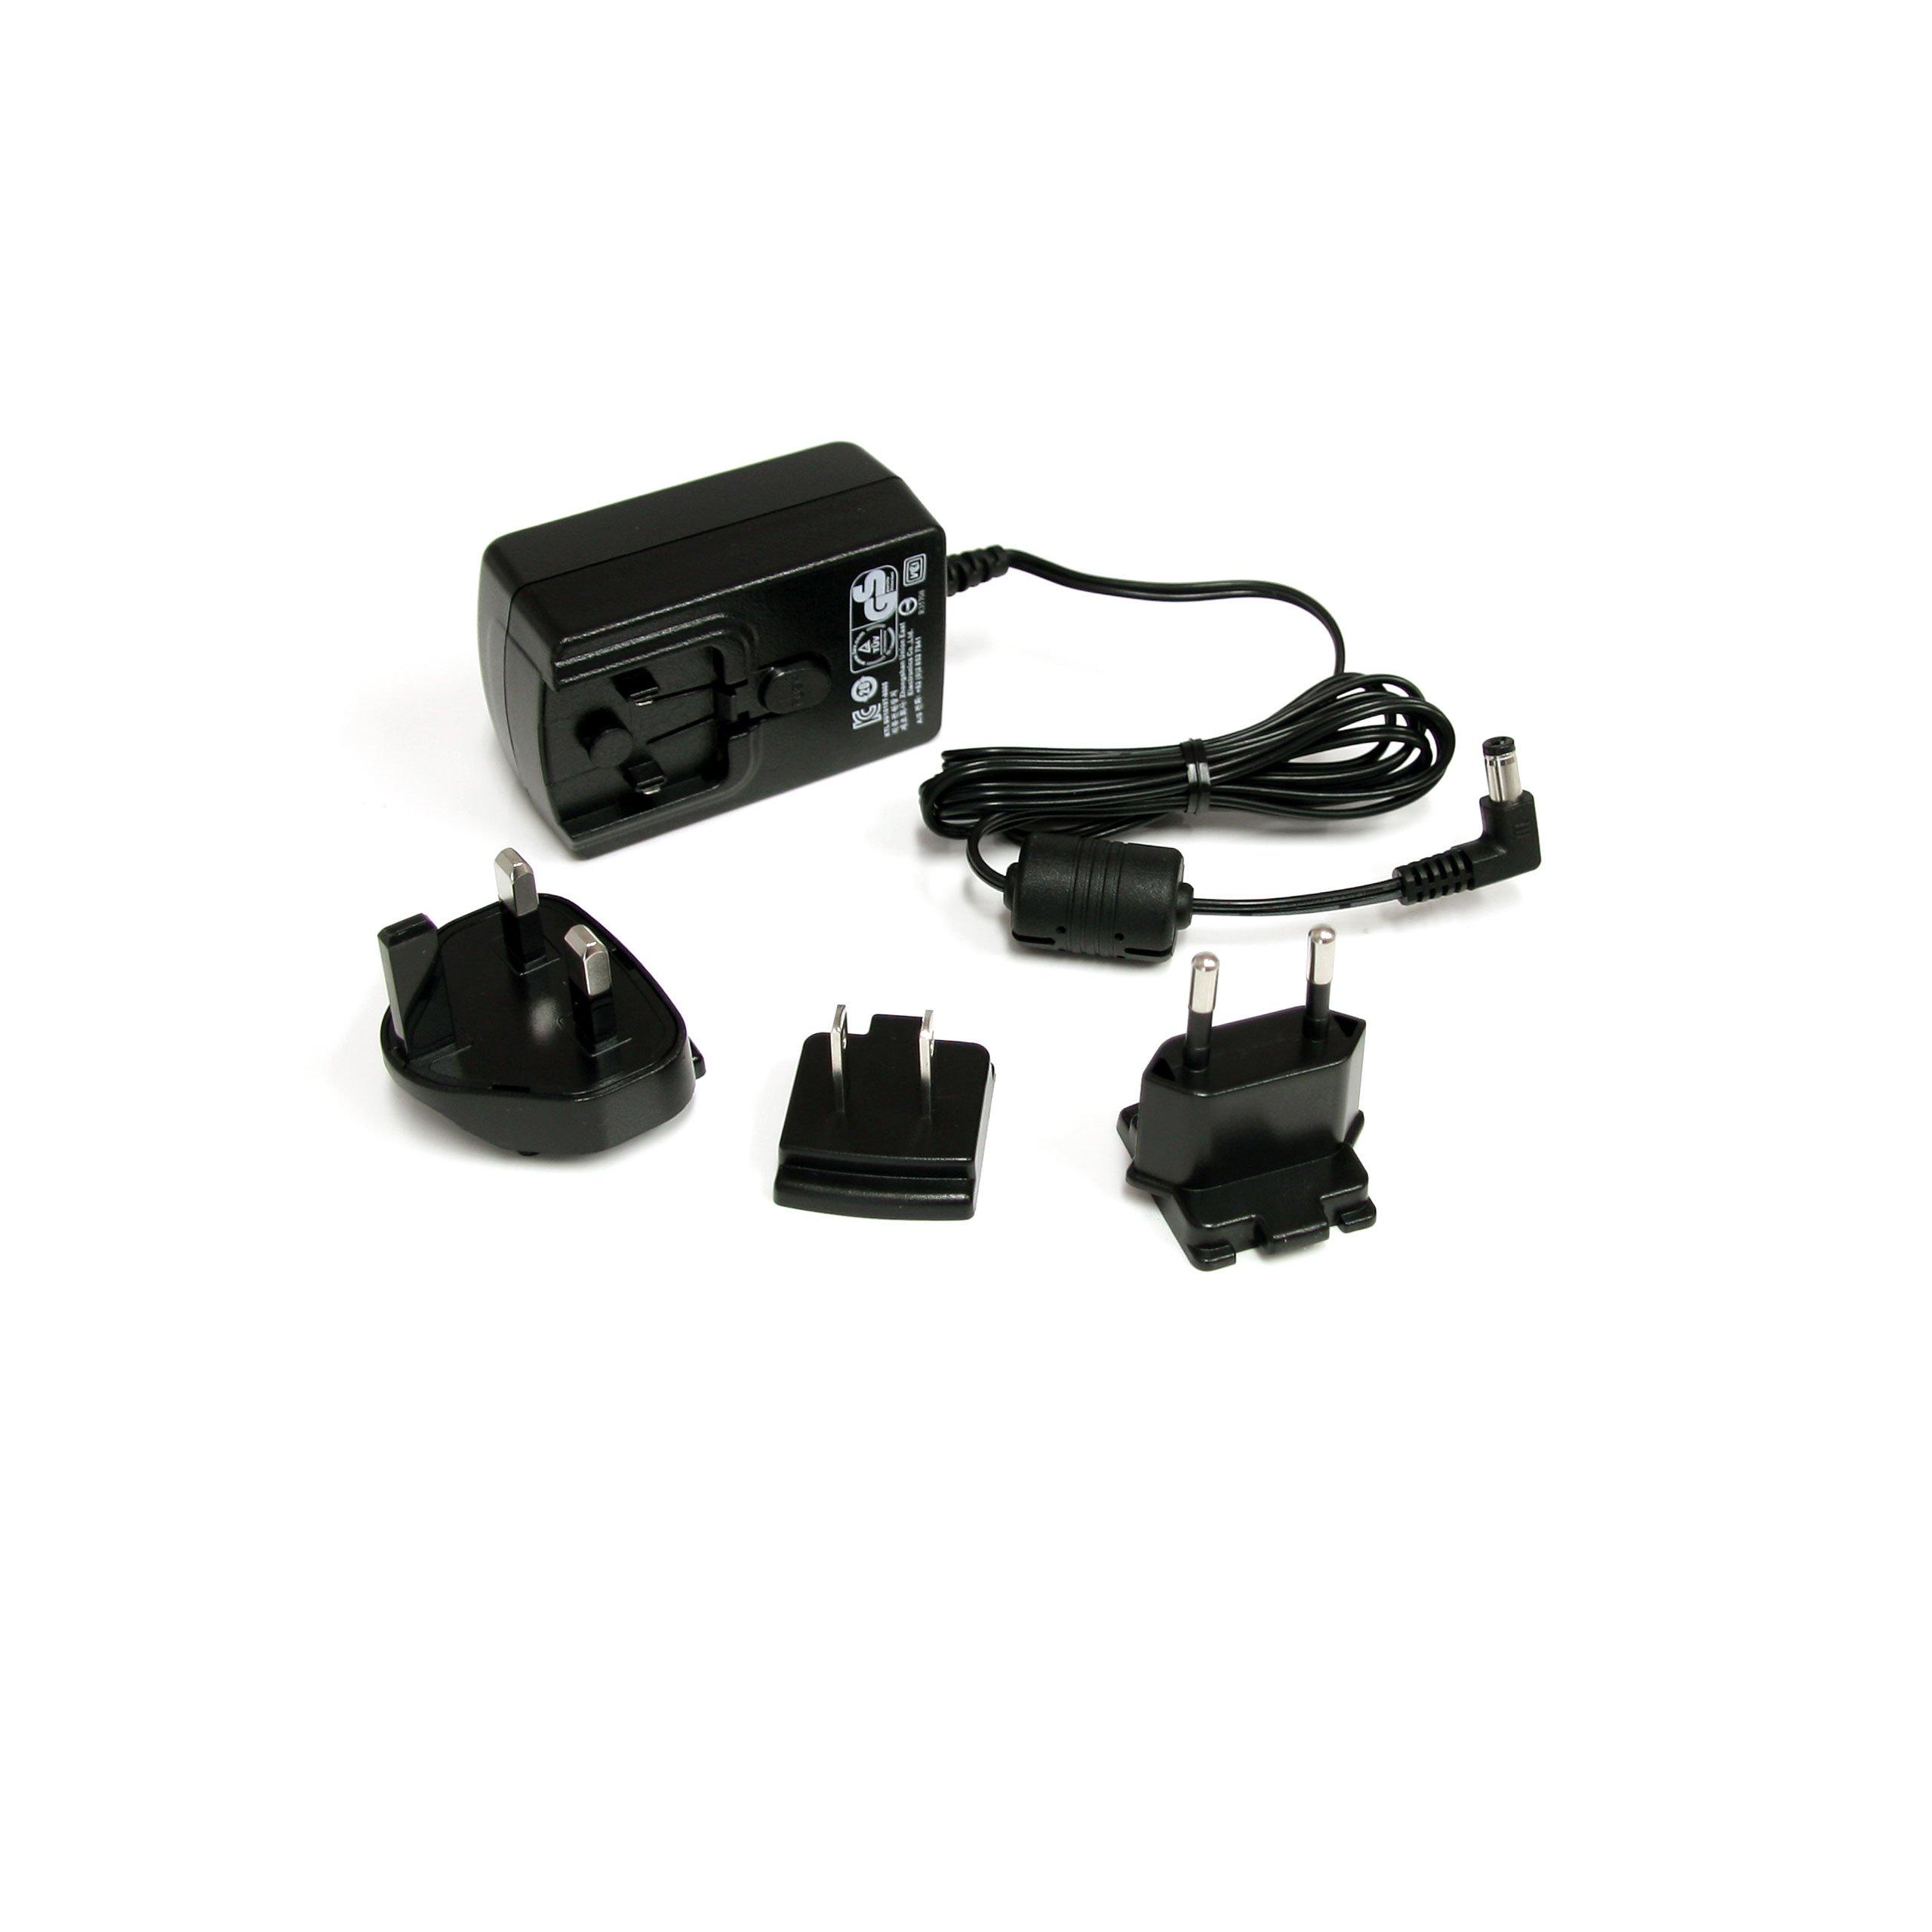 DC Adapter - 12V Adapter - 1.5A - Universal Power Adapter - AC Adapter - DC Power Supply - DC Power Cord - Replacement Adapter